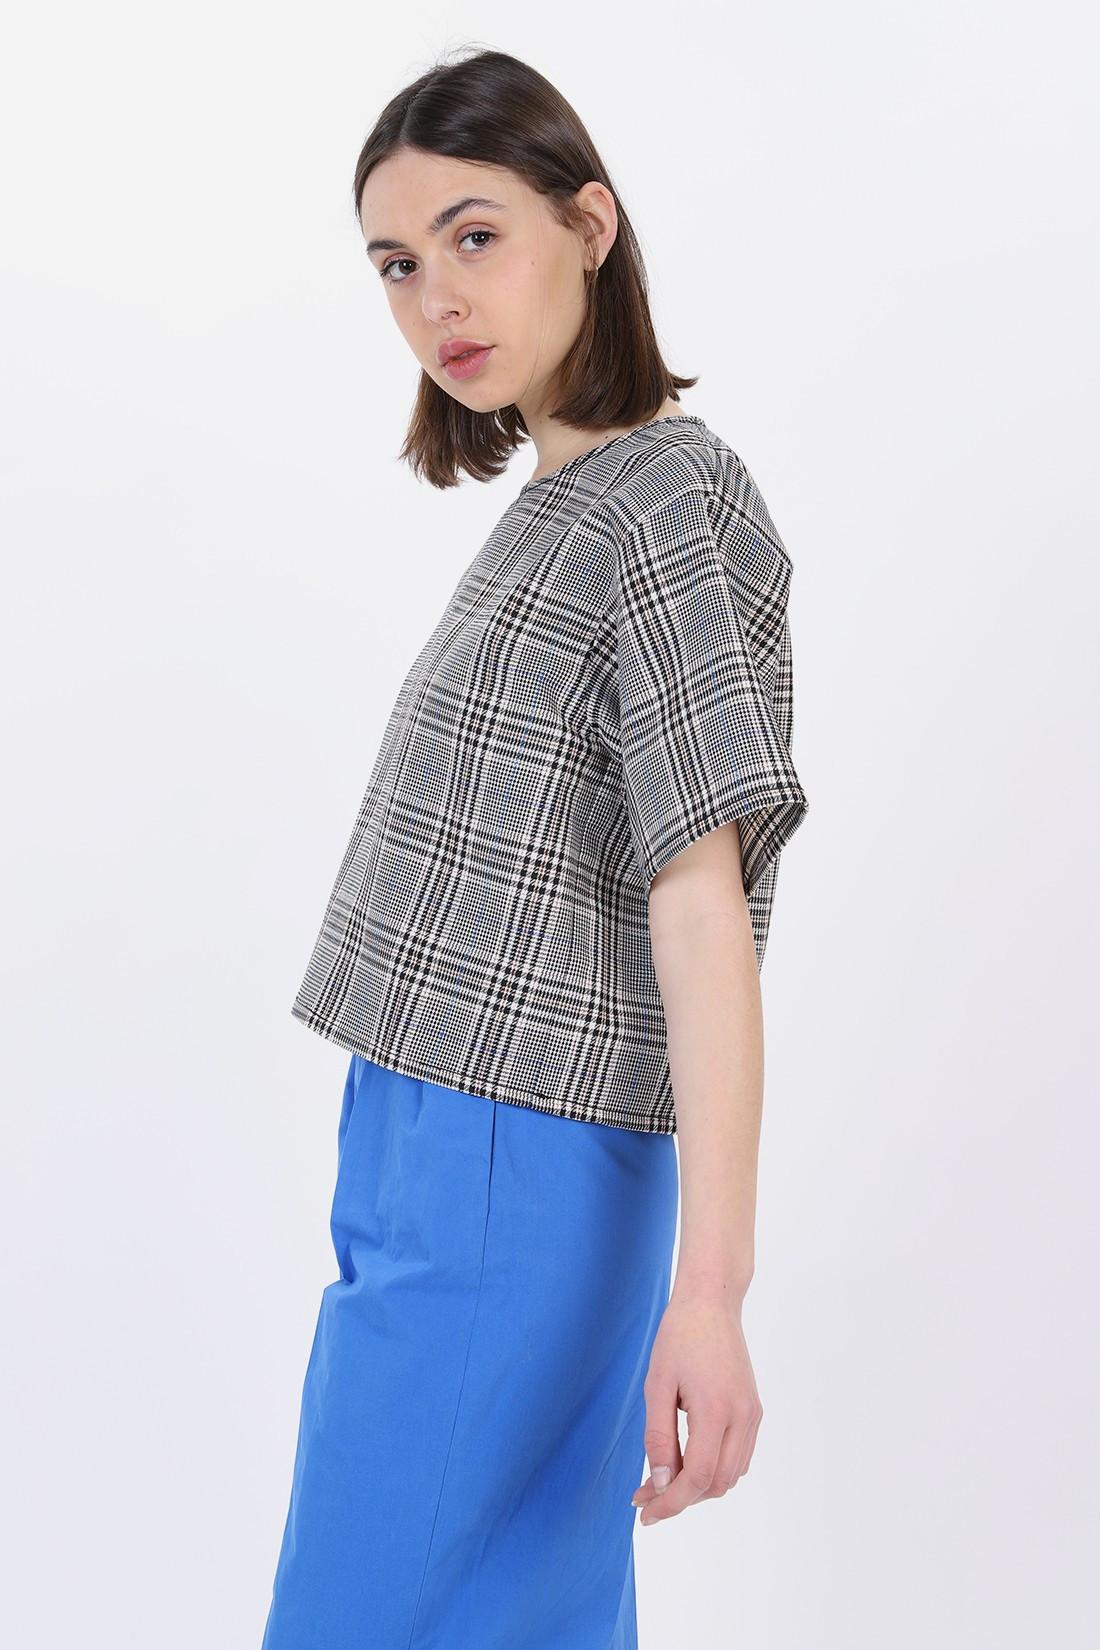 MM6 MAISON MARGIELA FOR WOMAN / Loose fit top White black